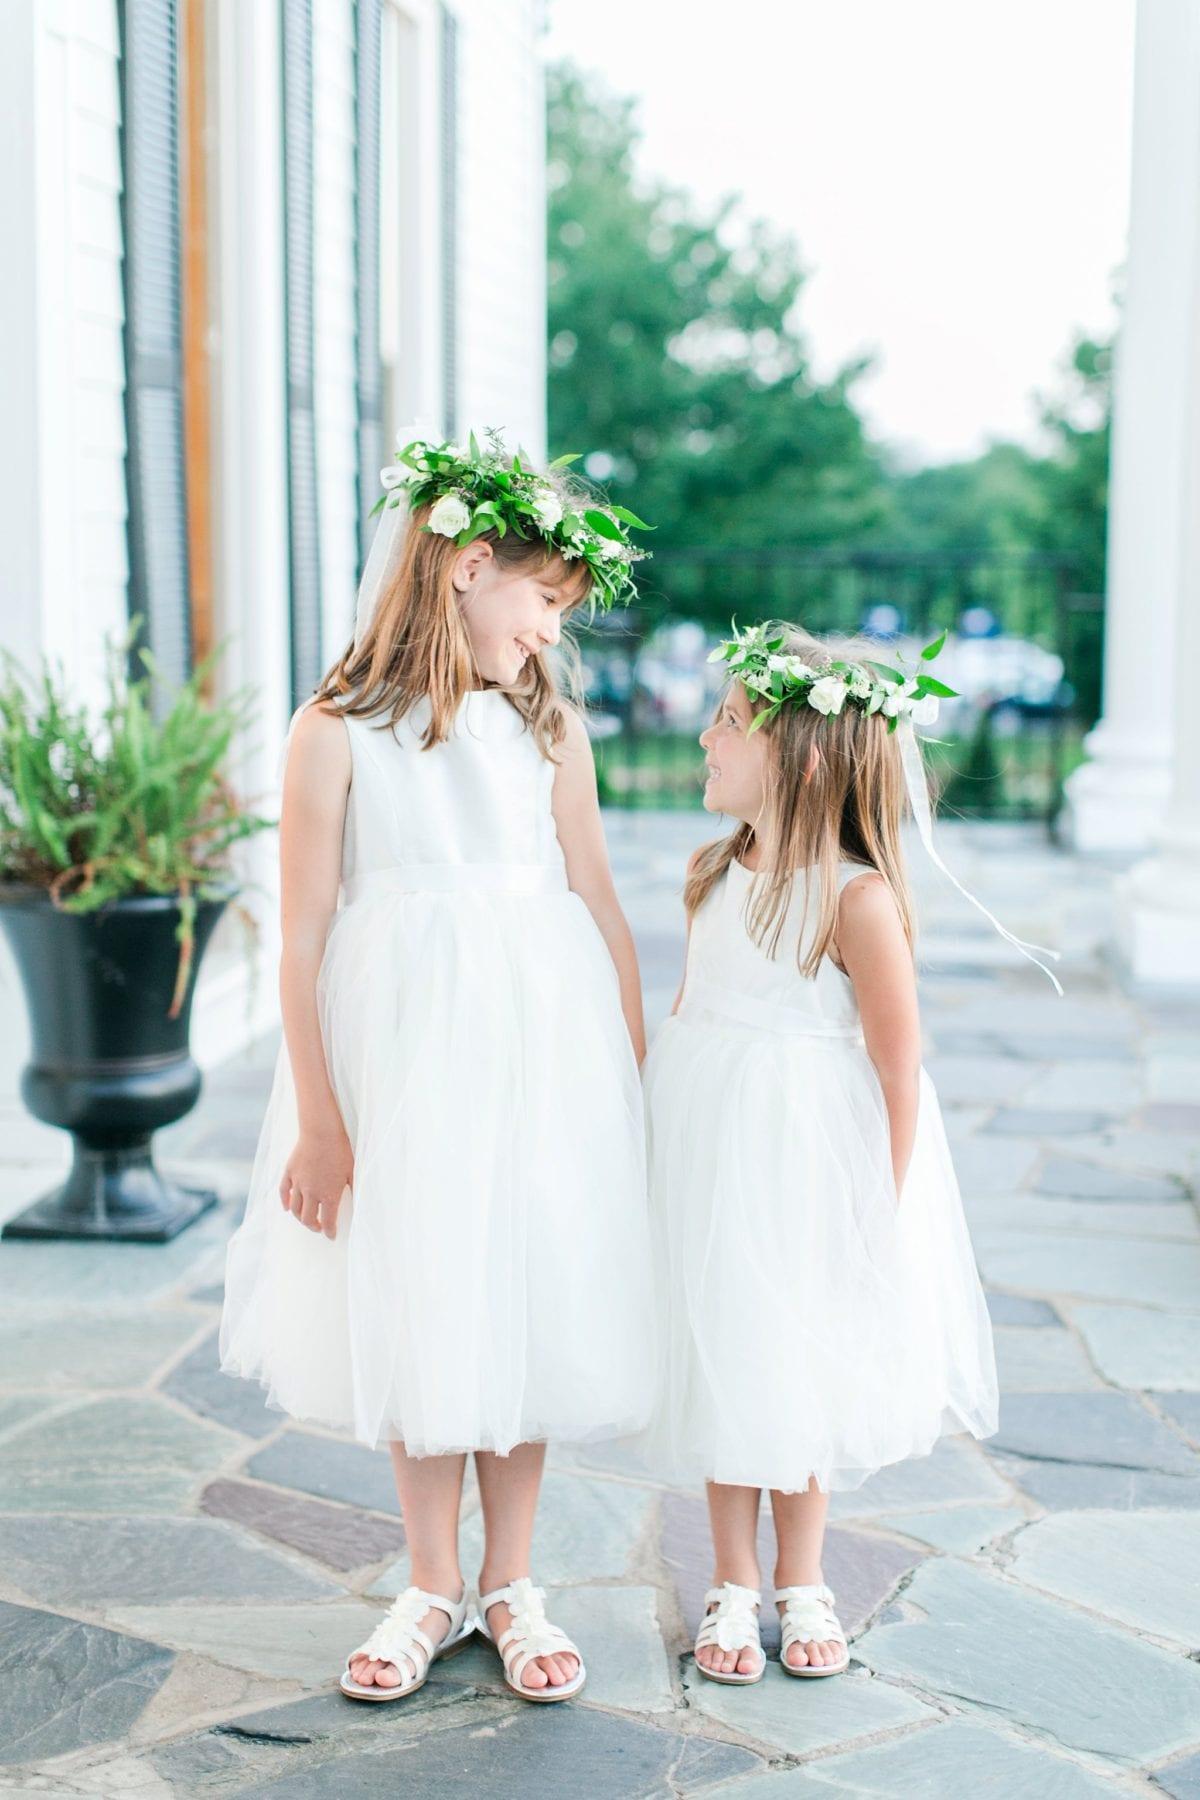 Bristow Manor Wedding Photos Virginia Wedding Photographer Lauren & Andrew Megan Kelsey Photography-724.jpg